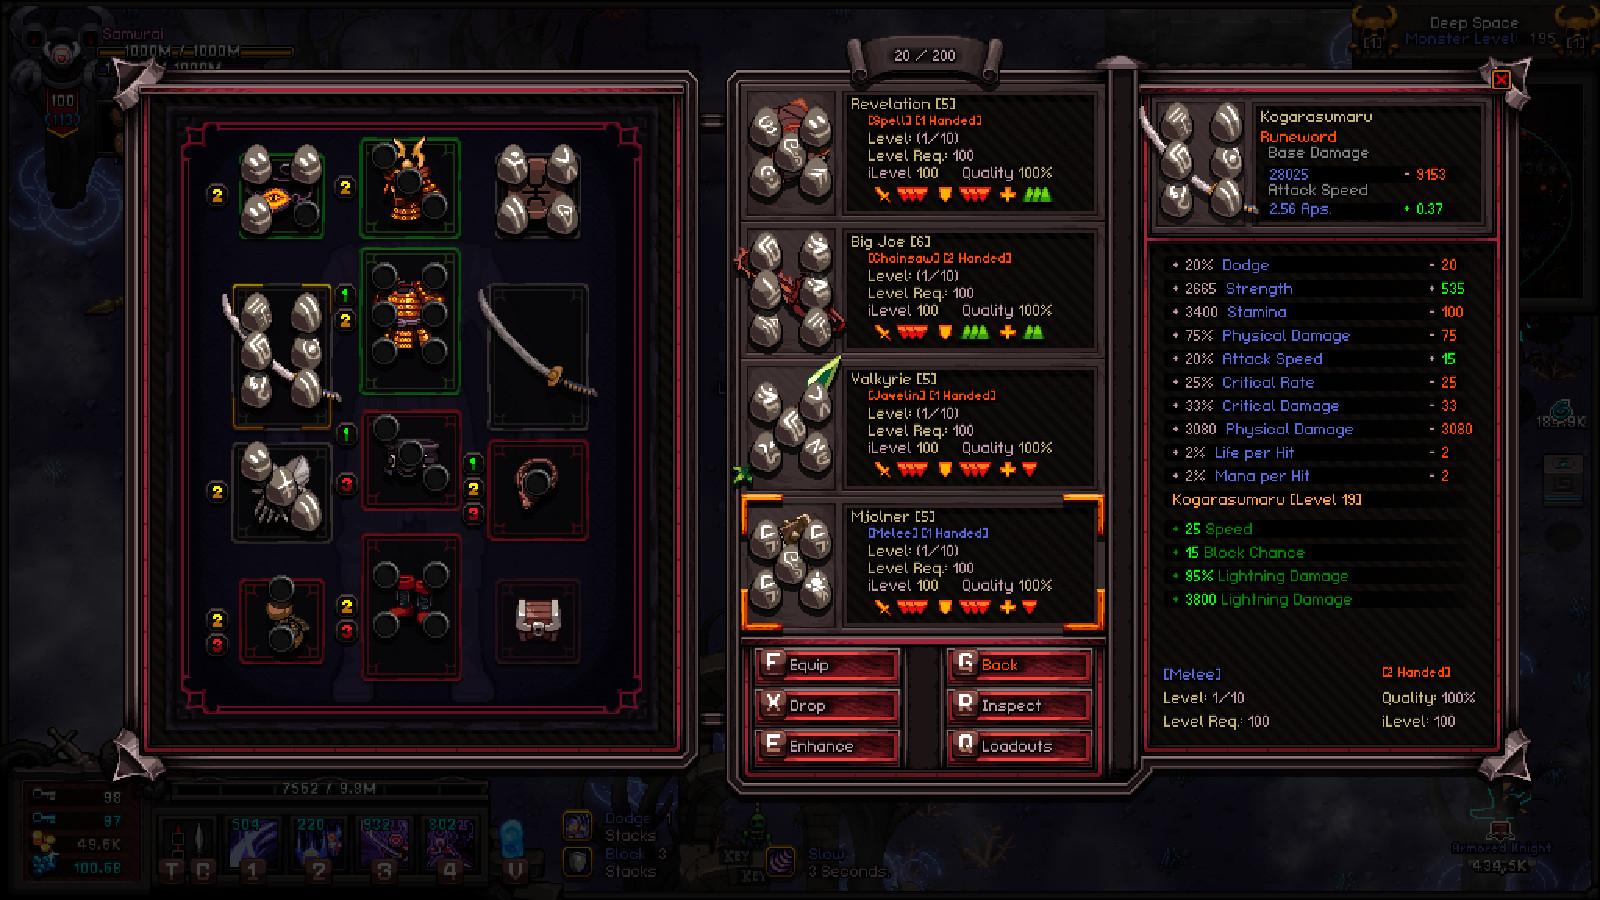 hero-siege-pc-screenshot-3